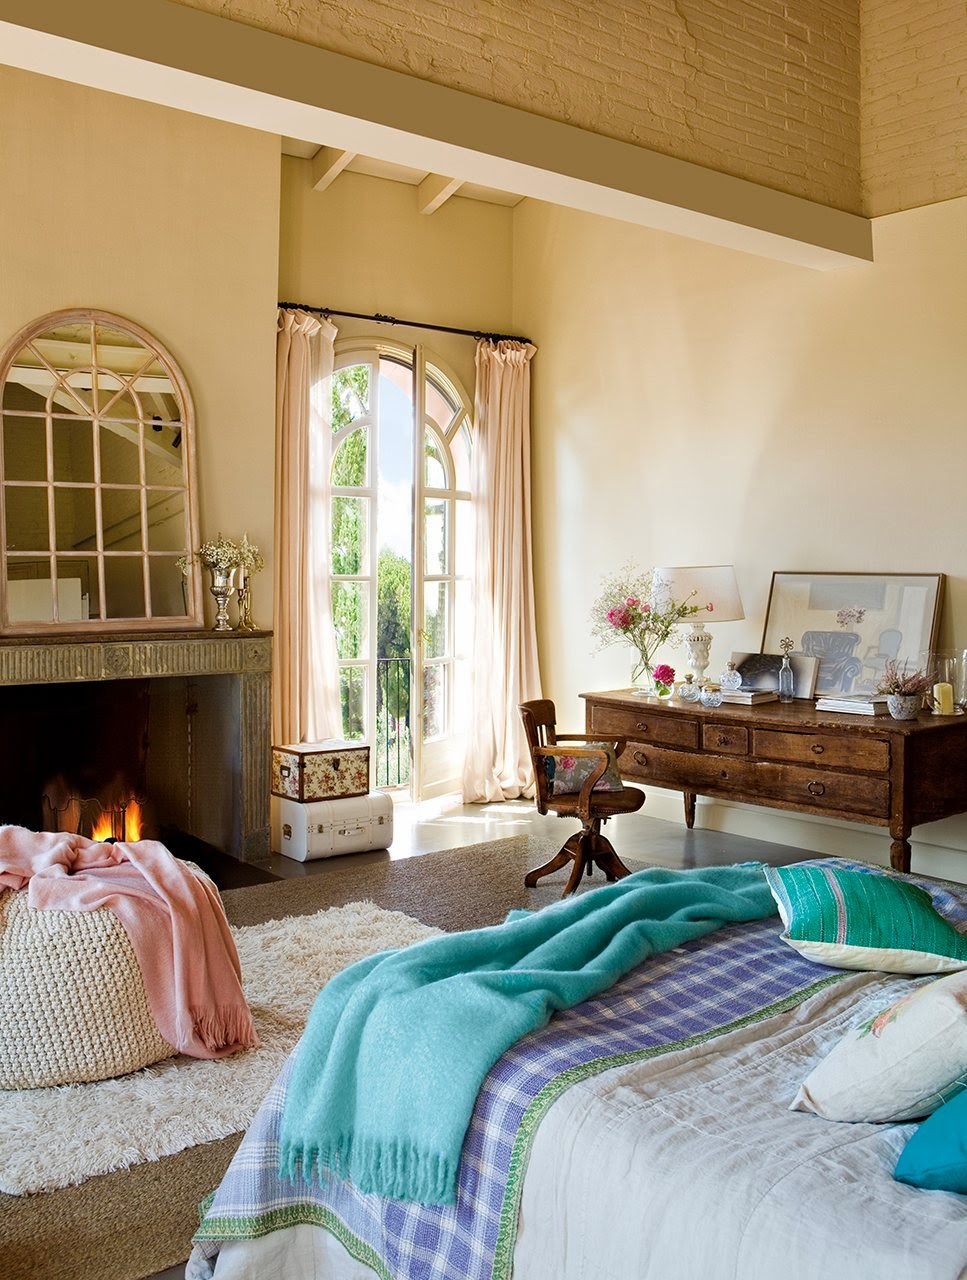 amenajari, interioare, decoratiuni, decor, design interior, amenajare dormitor, feminin, primavaratic, turcoaz, roz ,